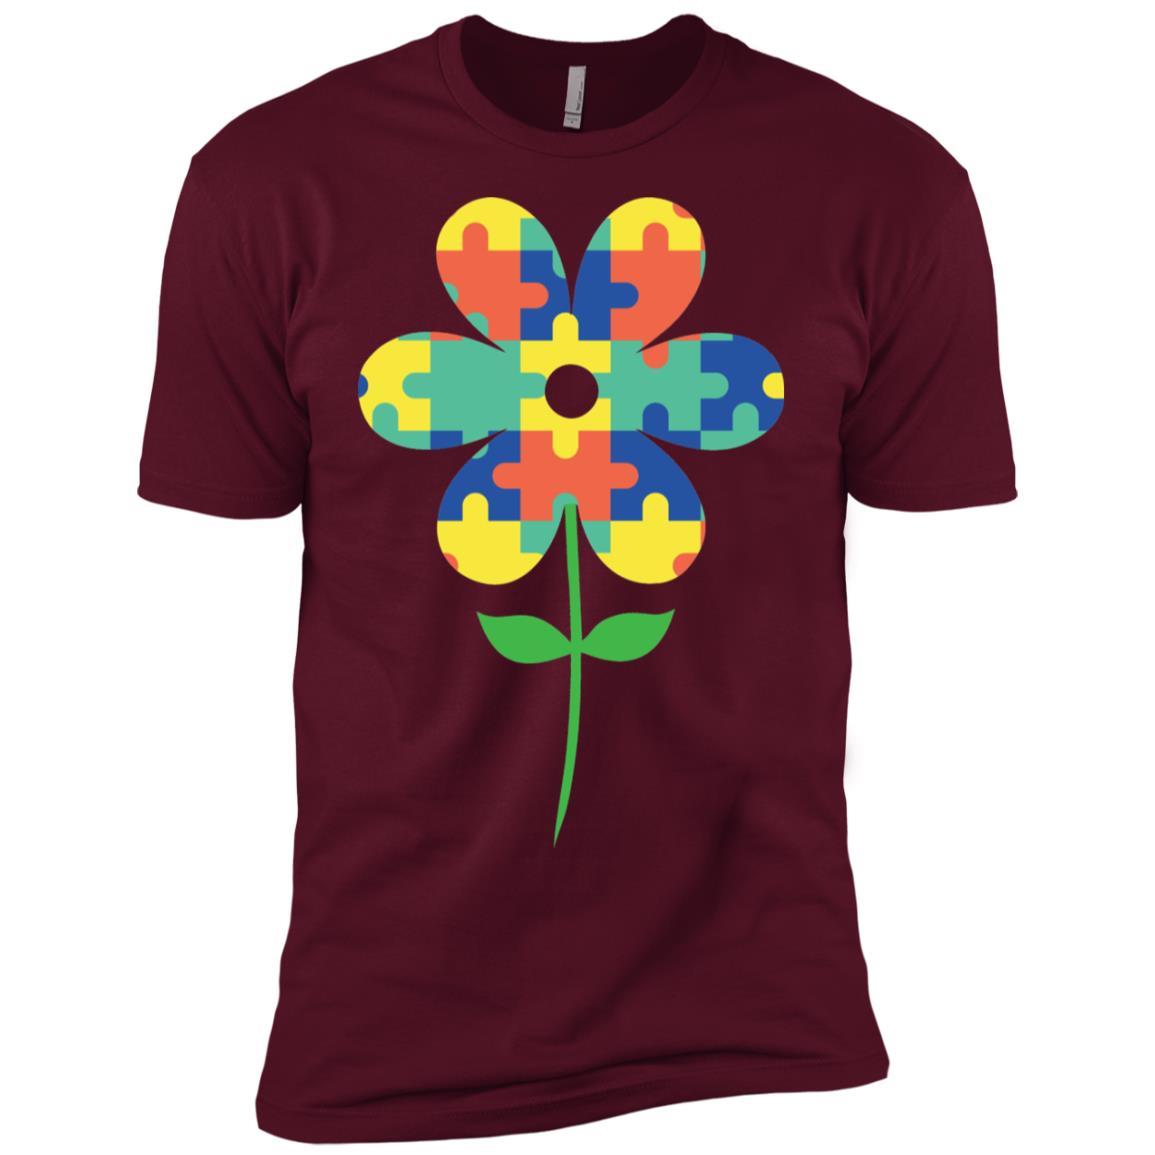 Autism Awareness Acceptance Puzzle Flower Tee Men Short Sleeve T-Shirt